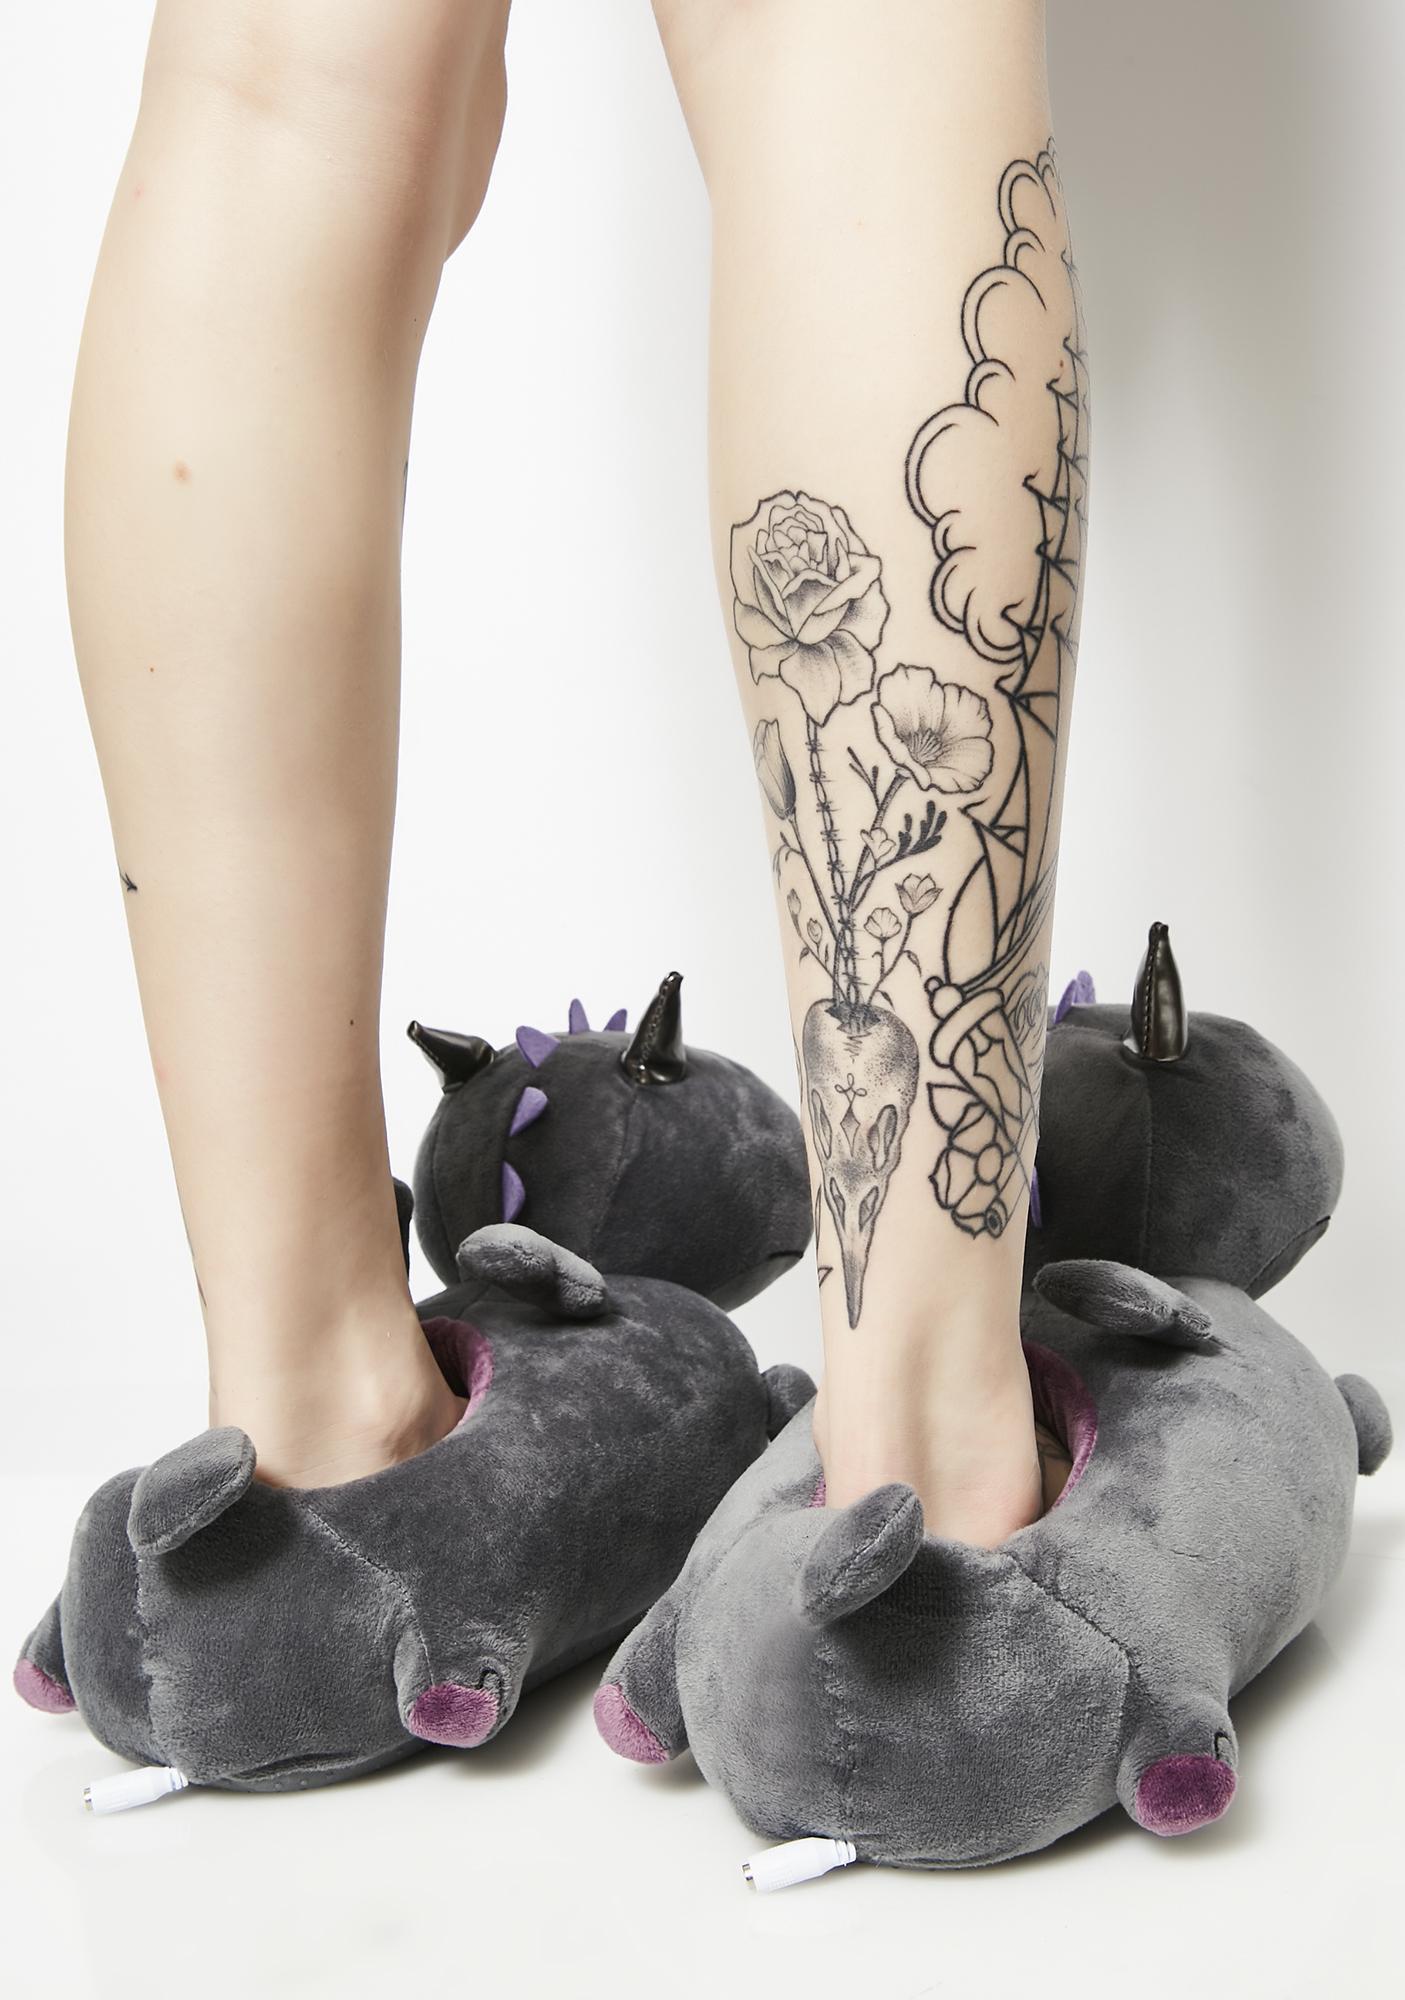 Smoko Orochi Dragon Heated Slippers